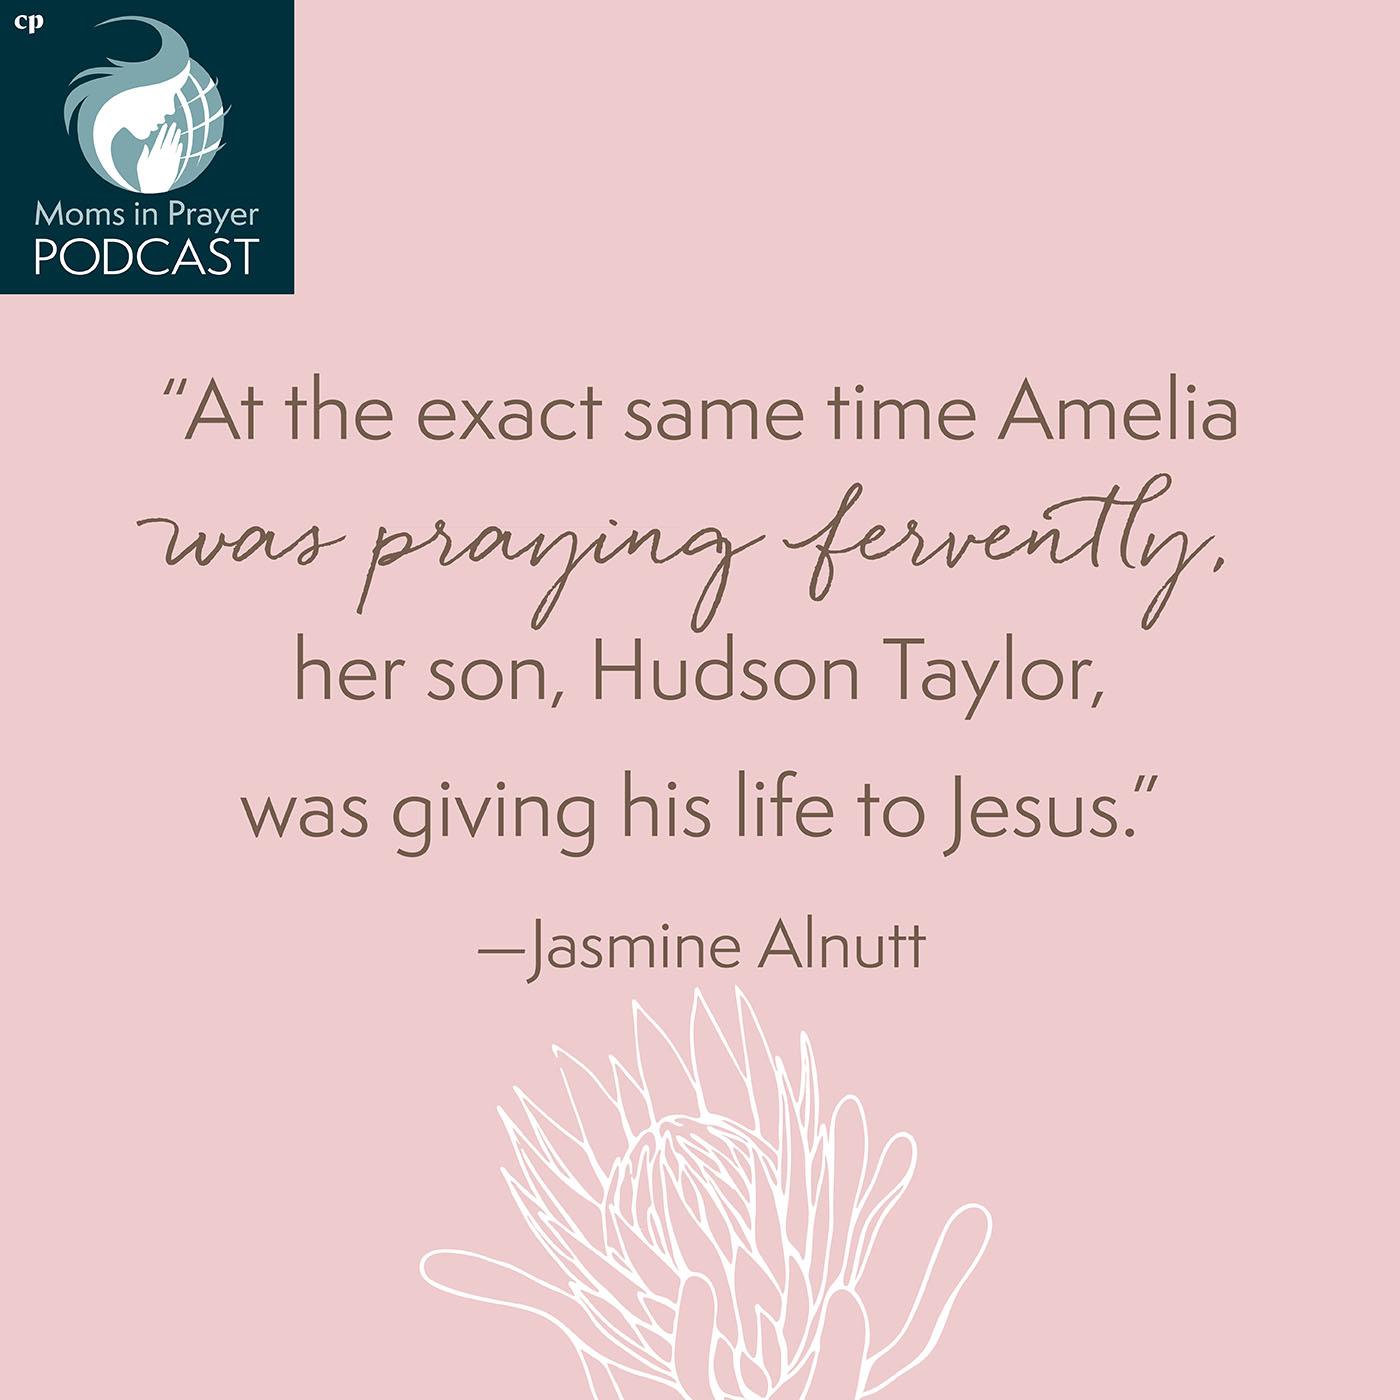 Hudson Taylor's praying mom Amelia